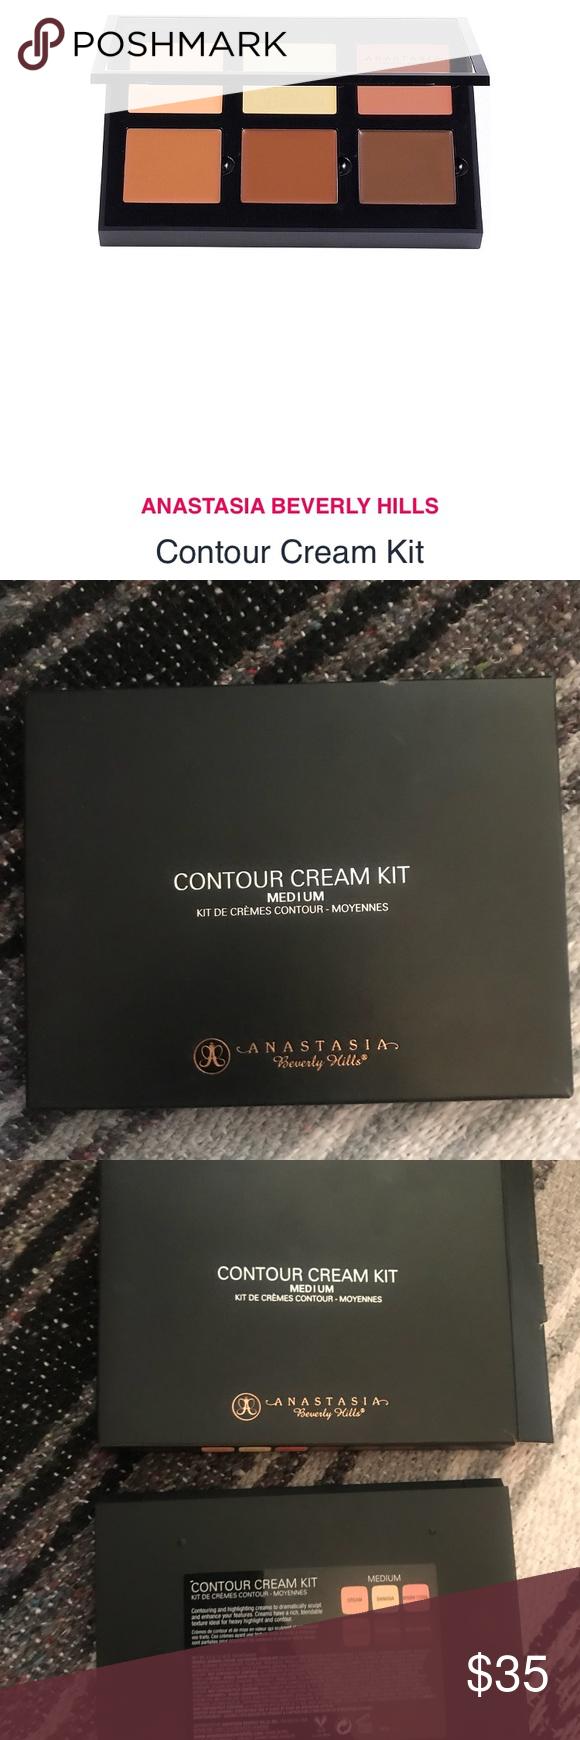 Anastasia Beverly Hills Contour Cream Kit My Posh Picks